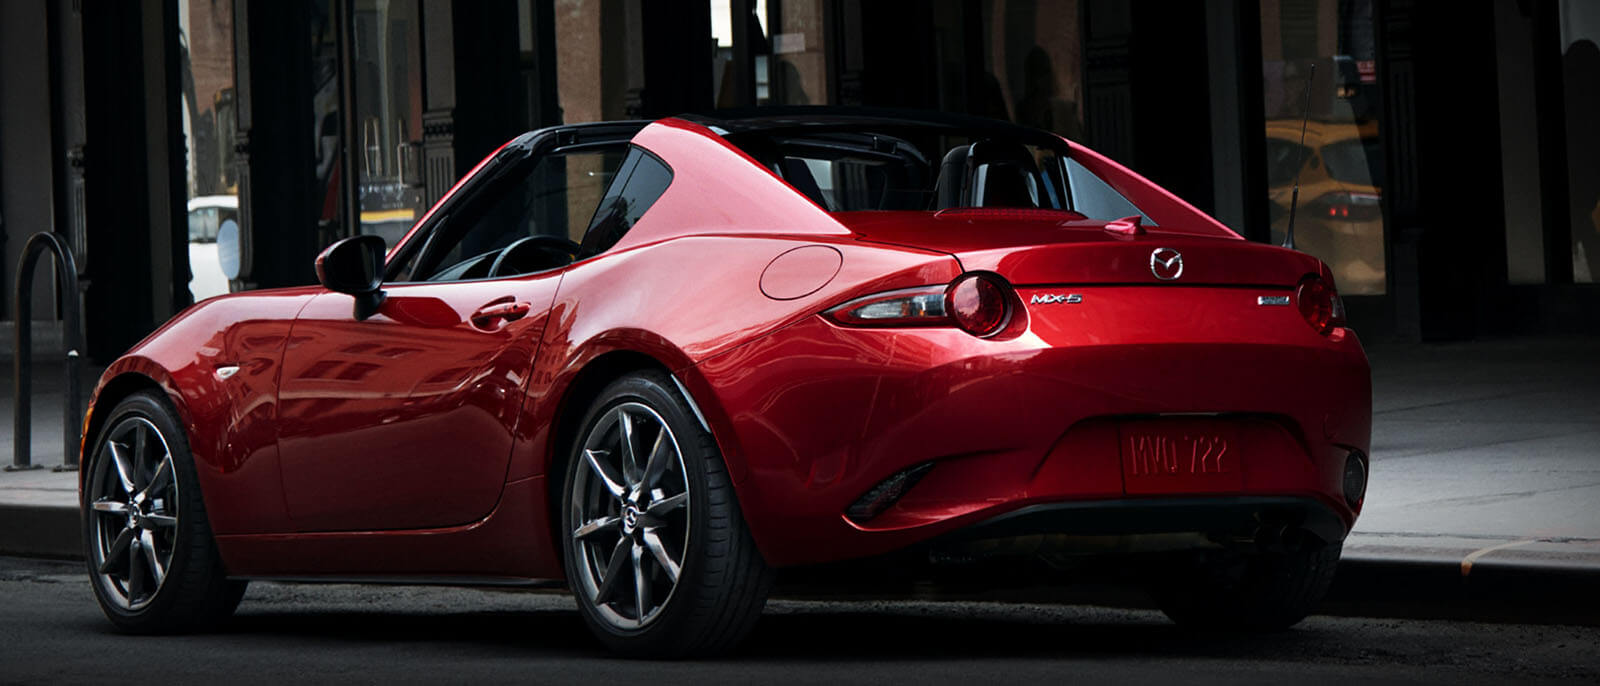 2017 Mazda MX-5 RF rear view